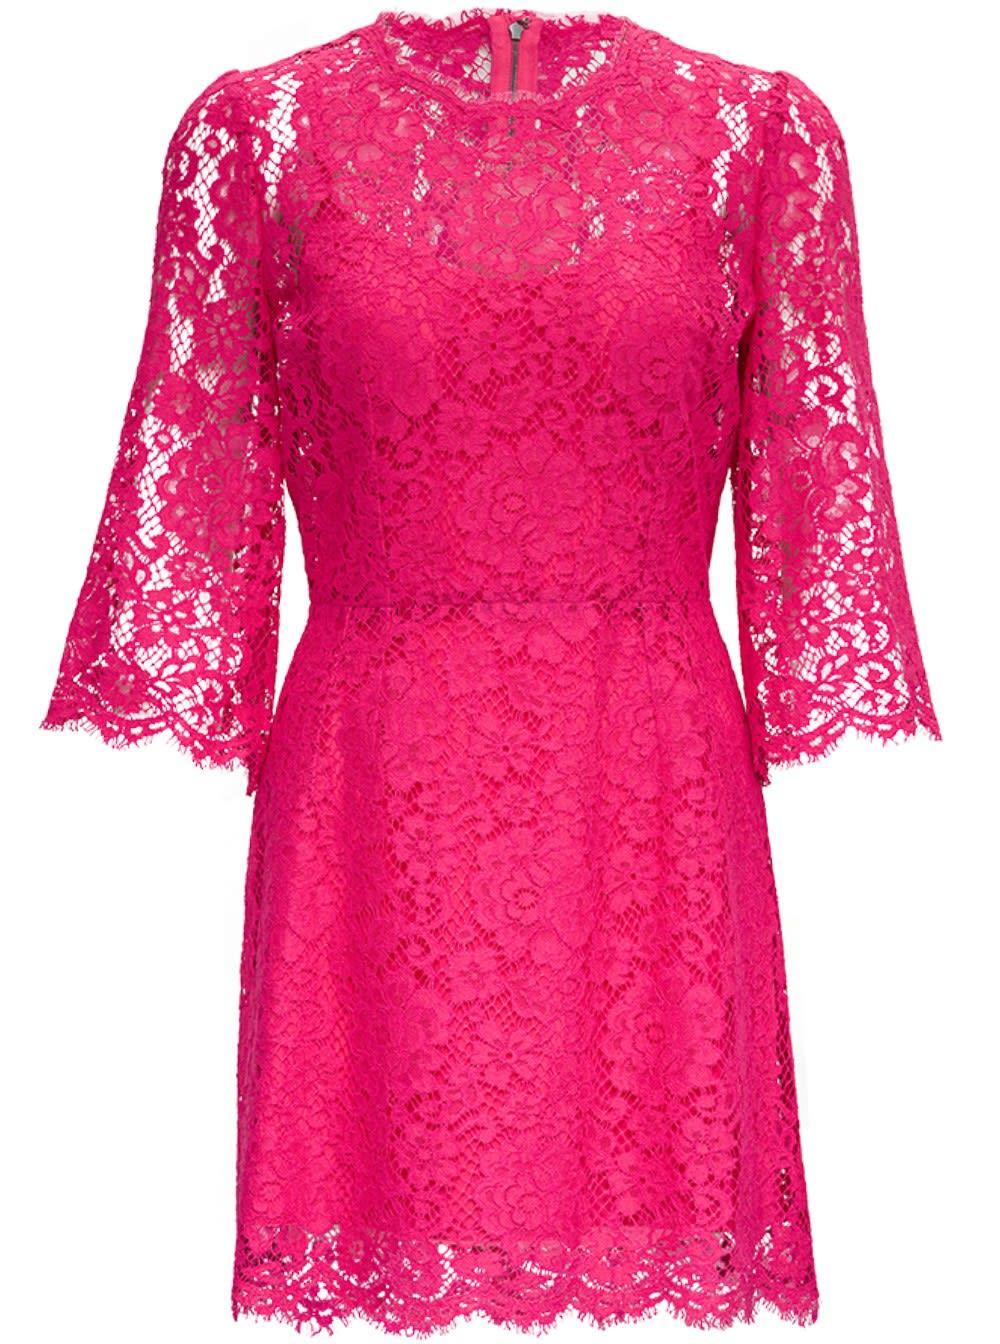 Dolce & Gabbana Cottons PINK LACE DRESS